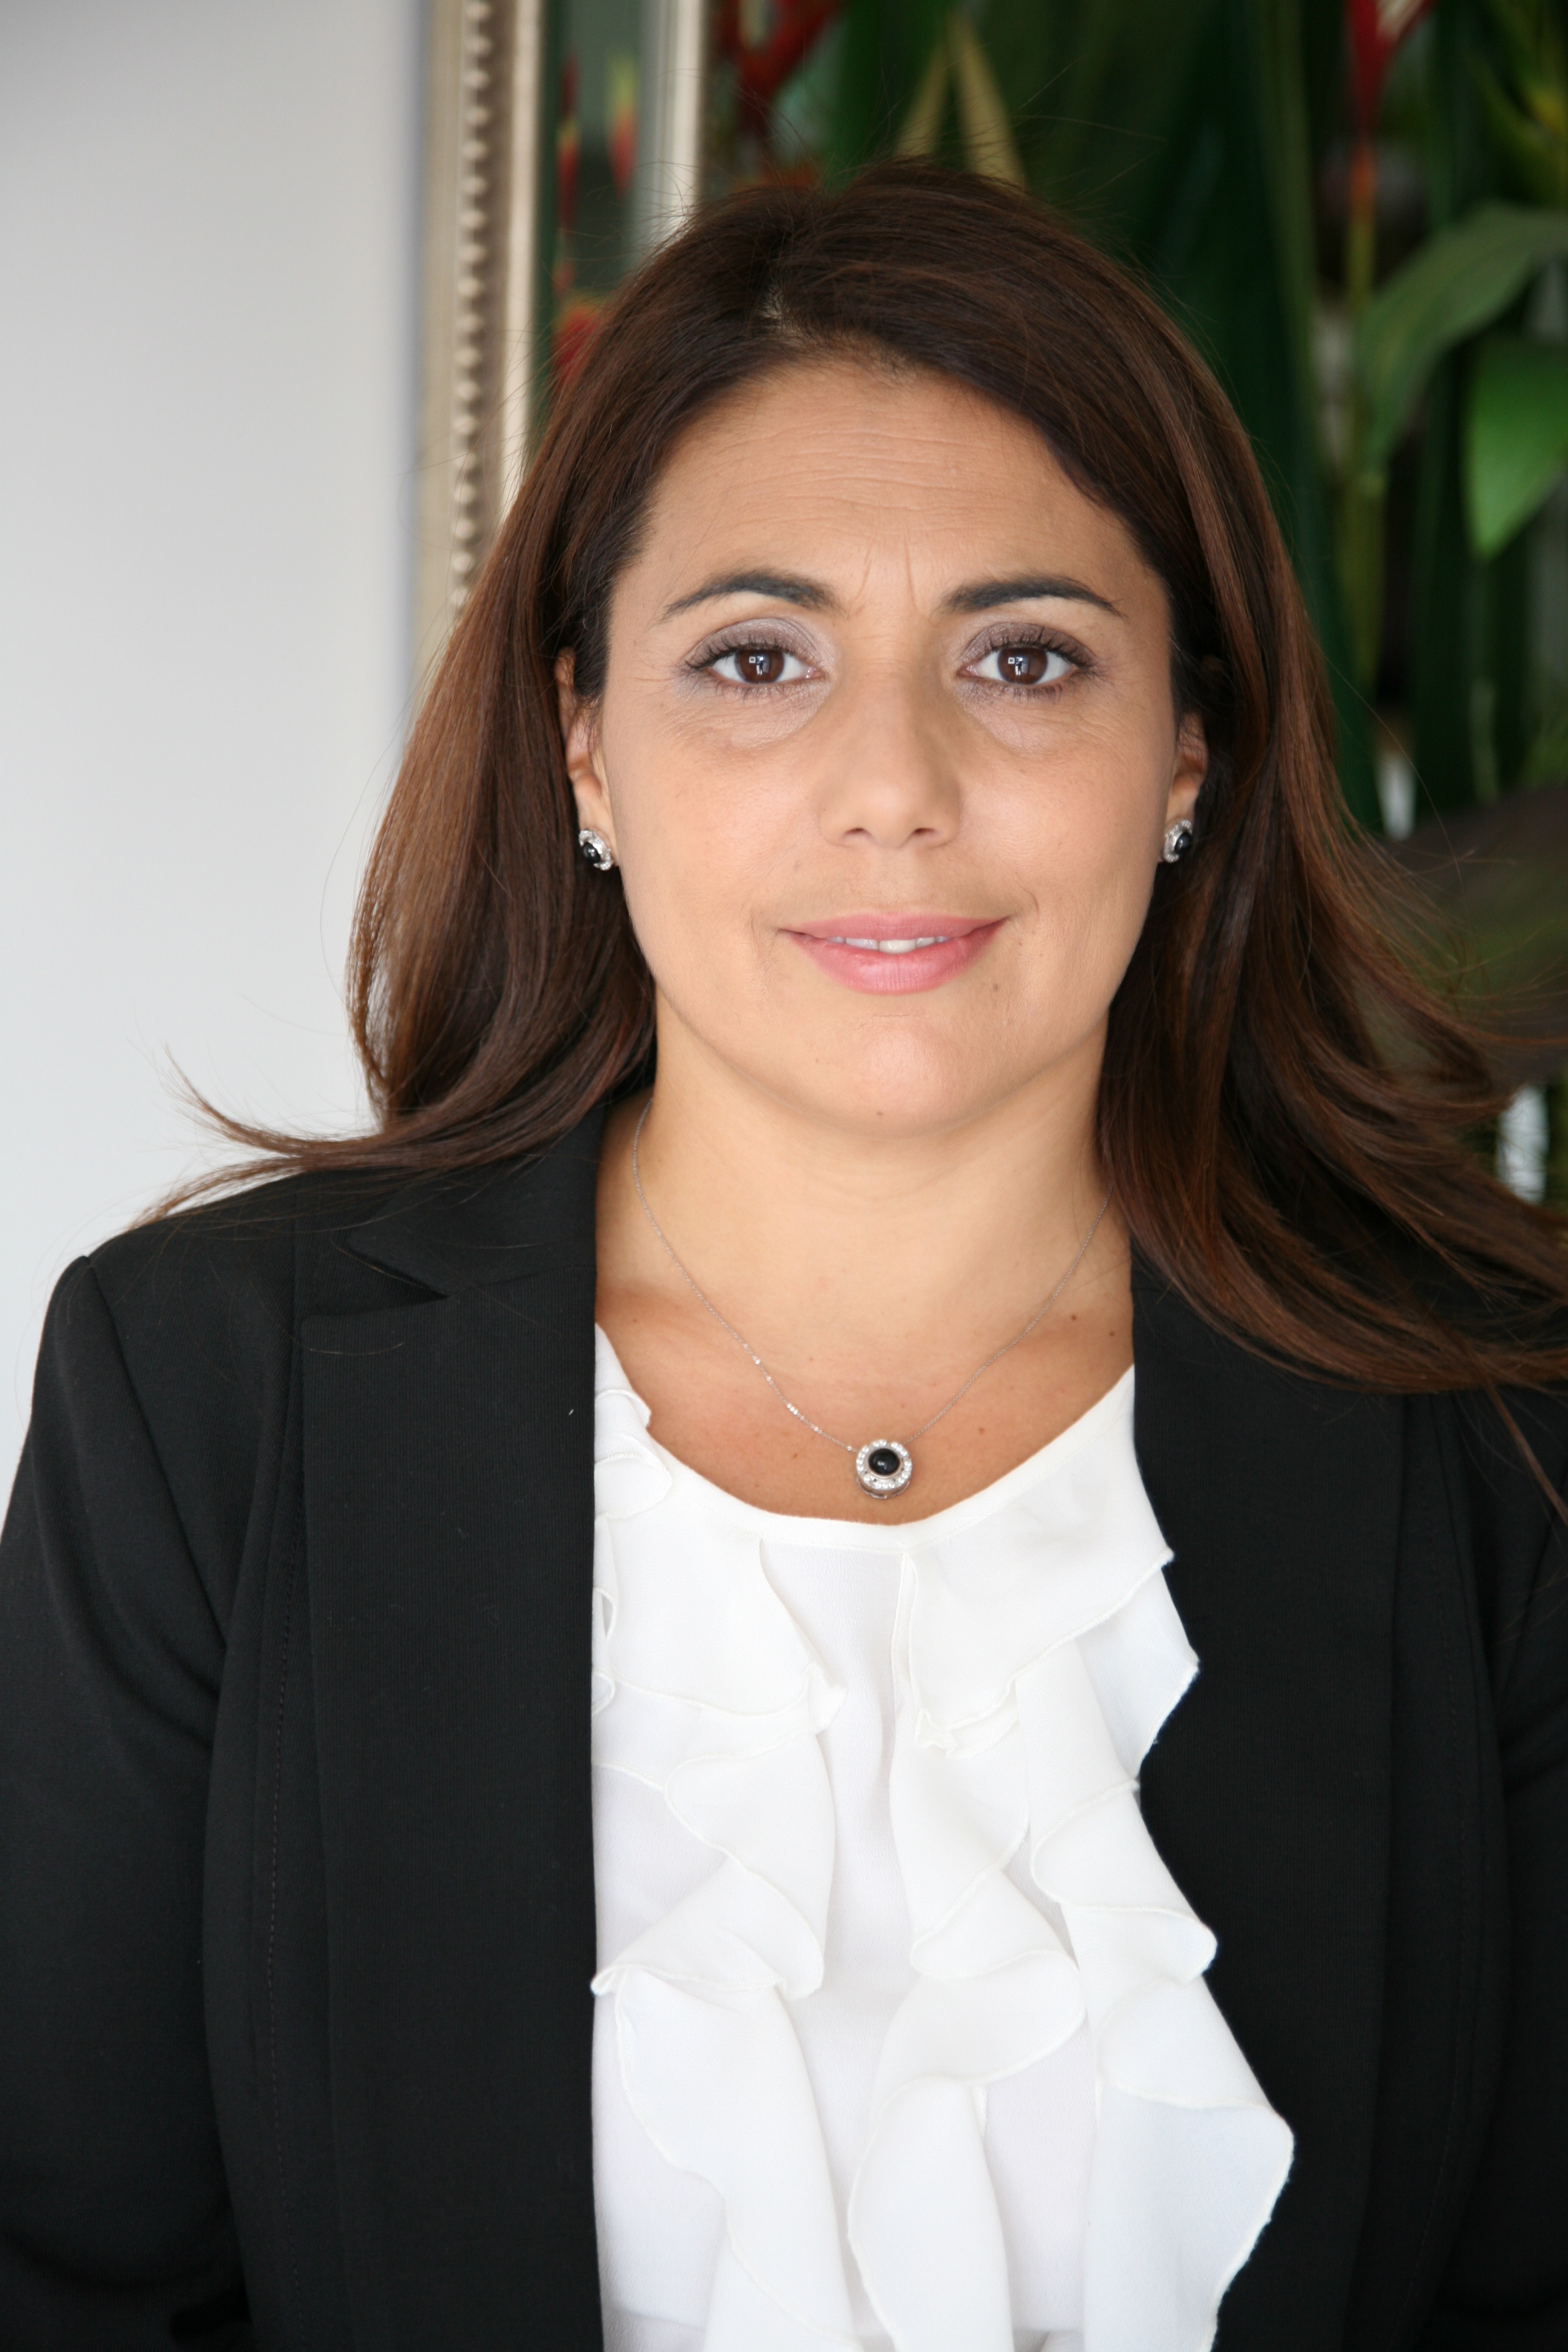 Funeral Directors Sydney – Laura Valerio